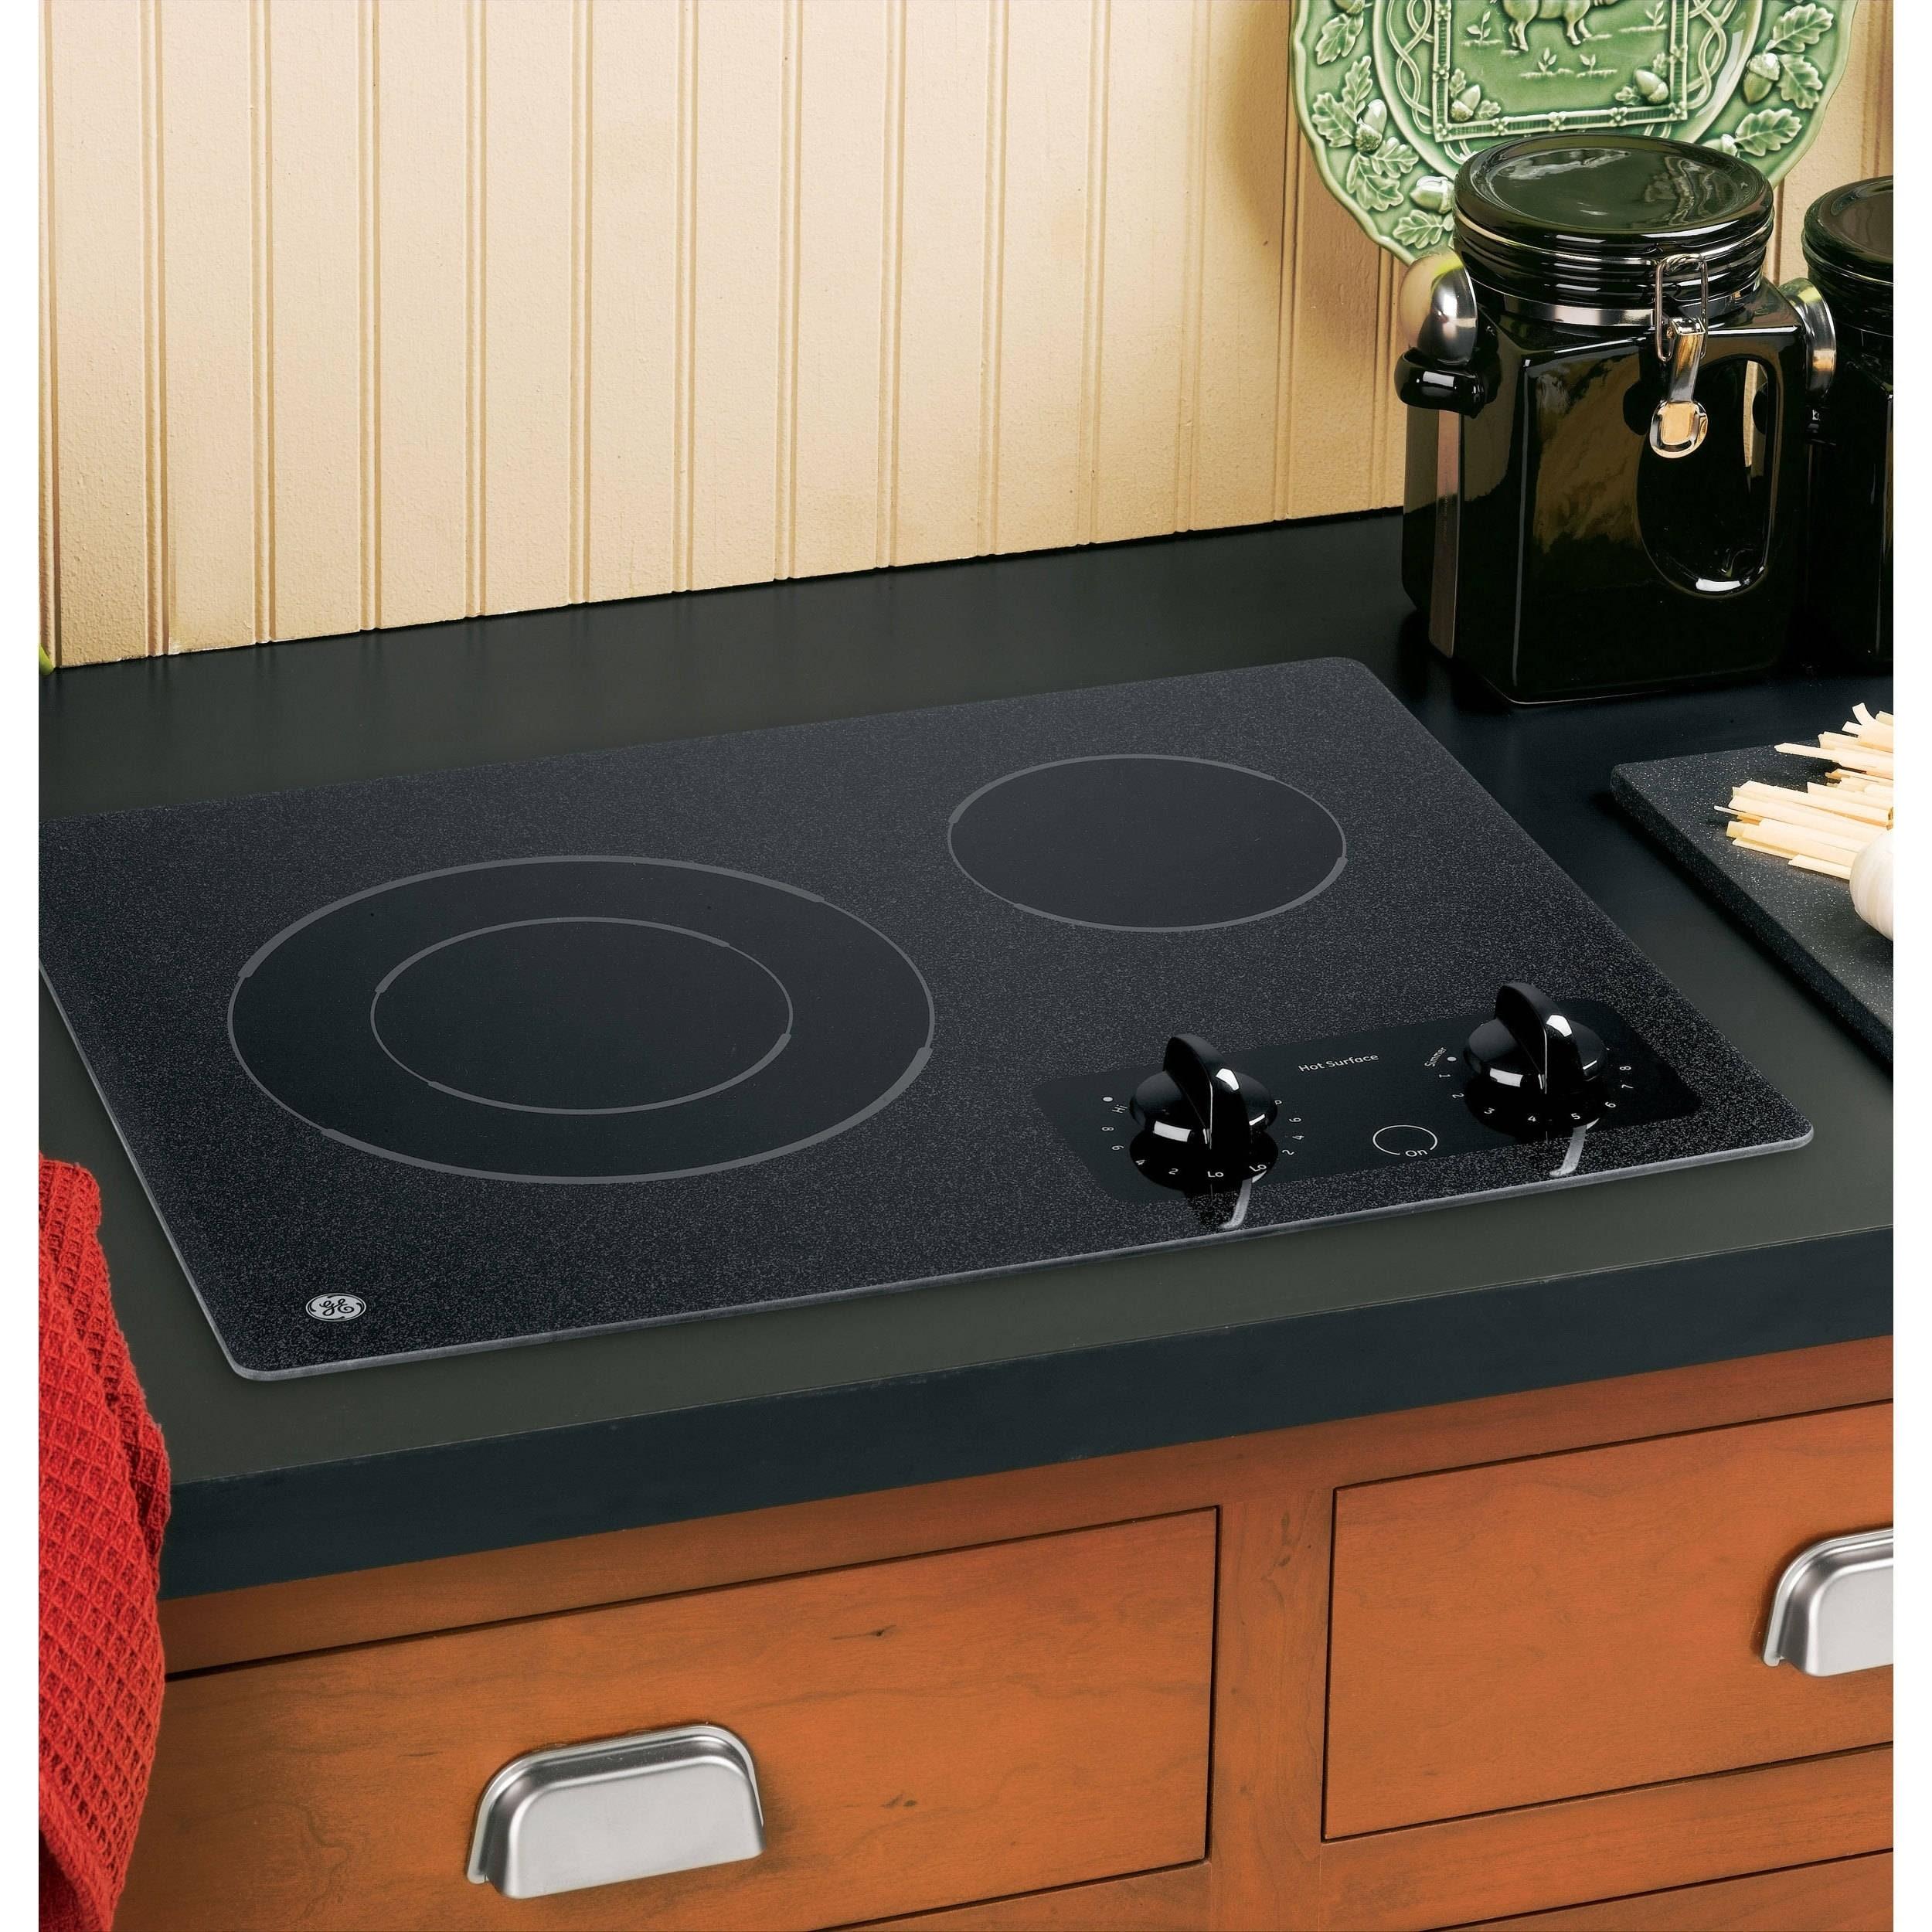 GE 21-inch Electric Radiant Cooktop black